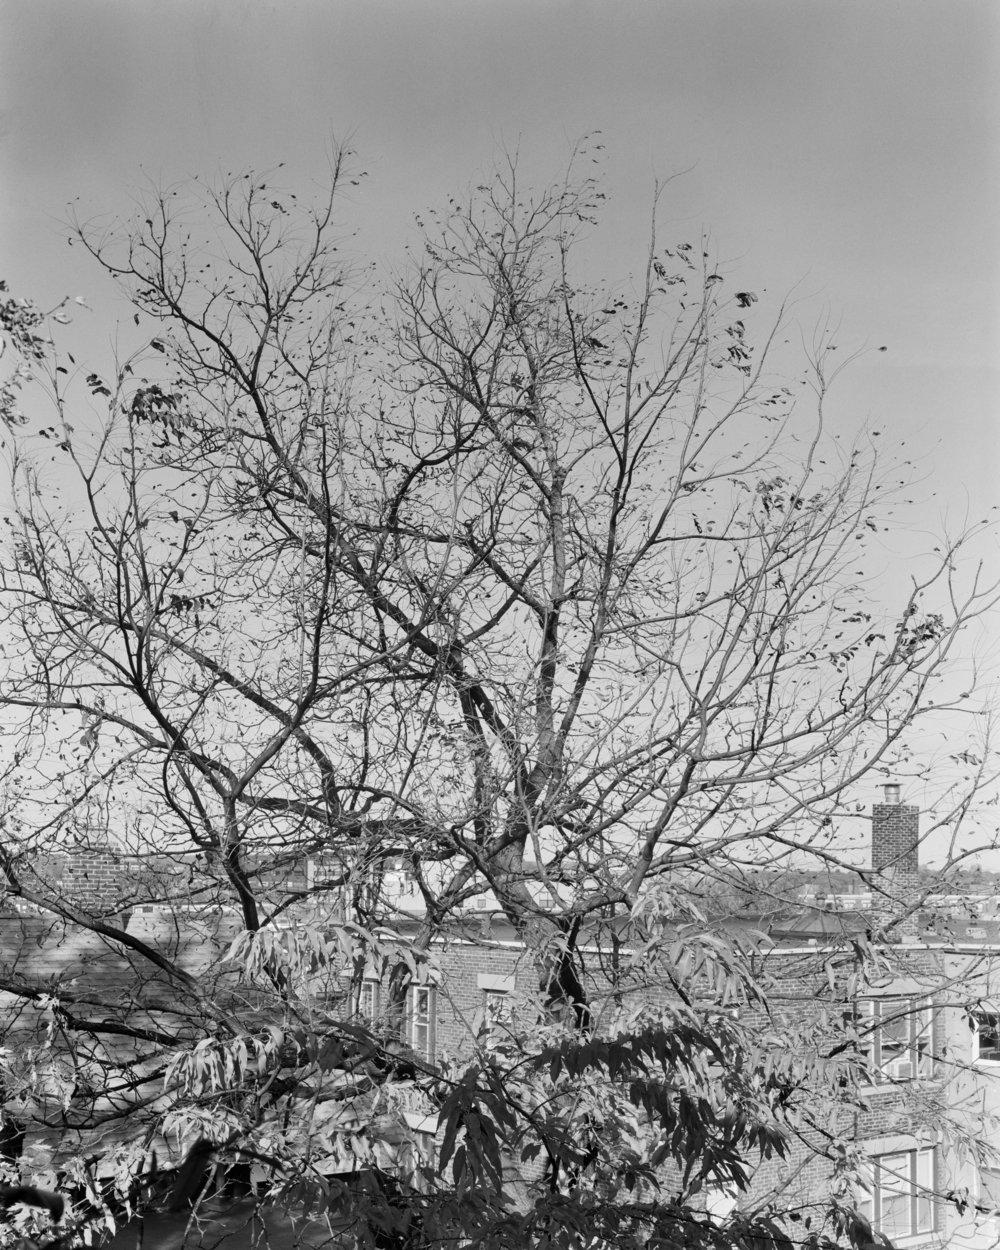 TreeFall 001.jpg